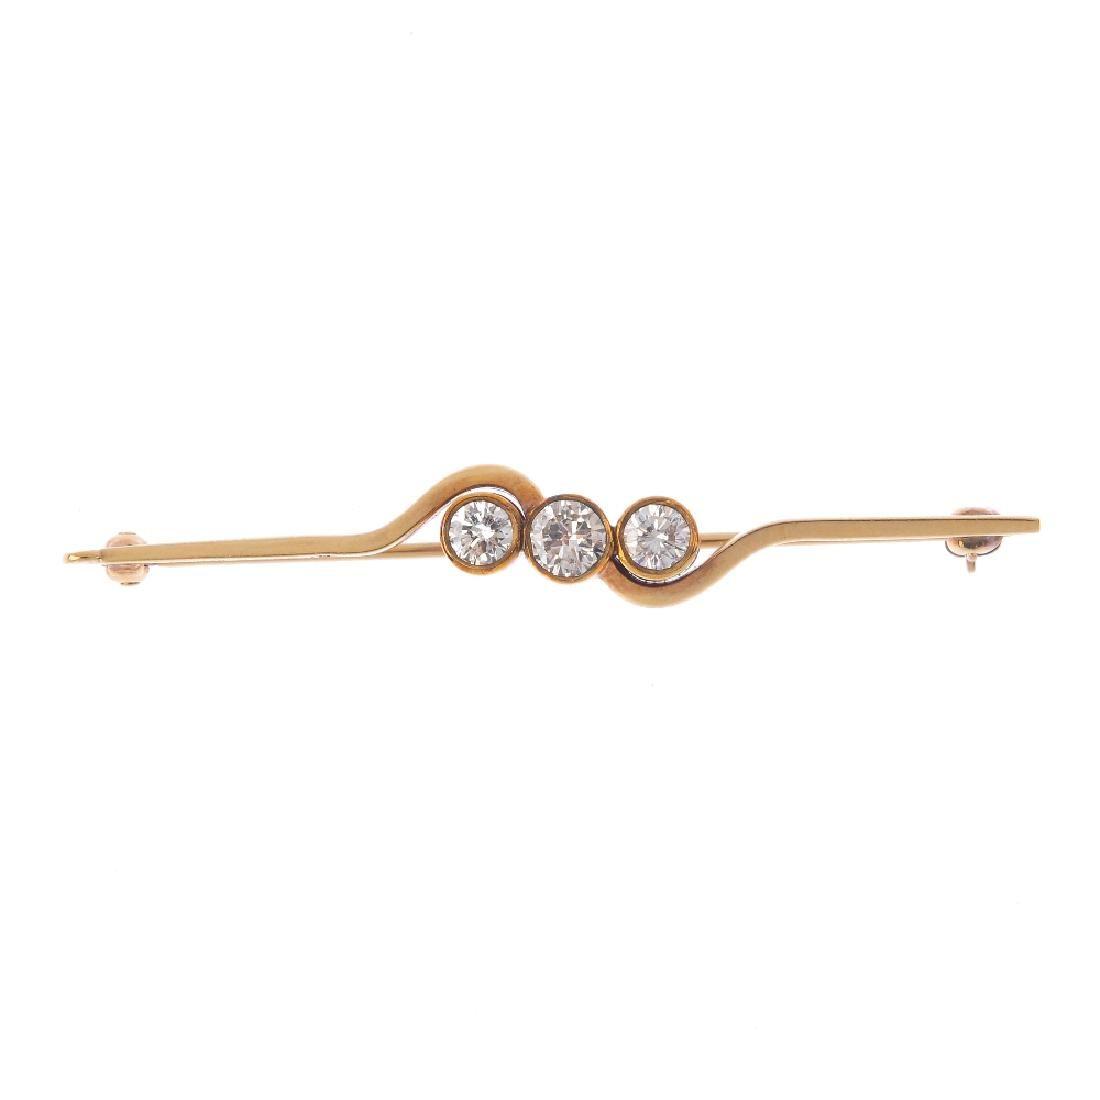 A 9ct gold diamond three-stone bar brooch. The